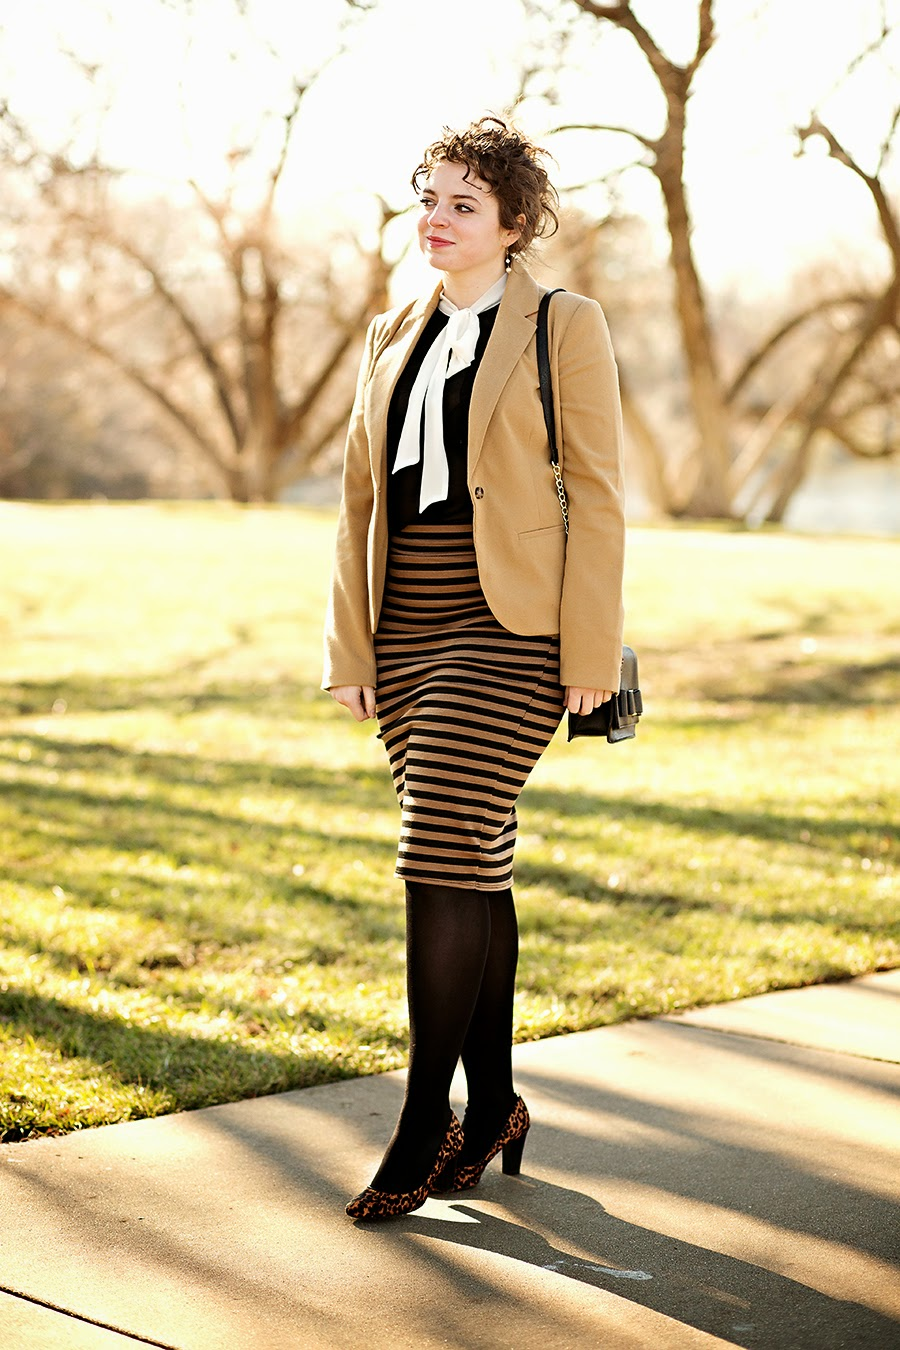 Tan and Black Professional Outfit // theadoredlife.com